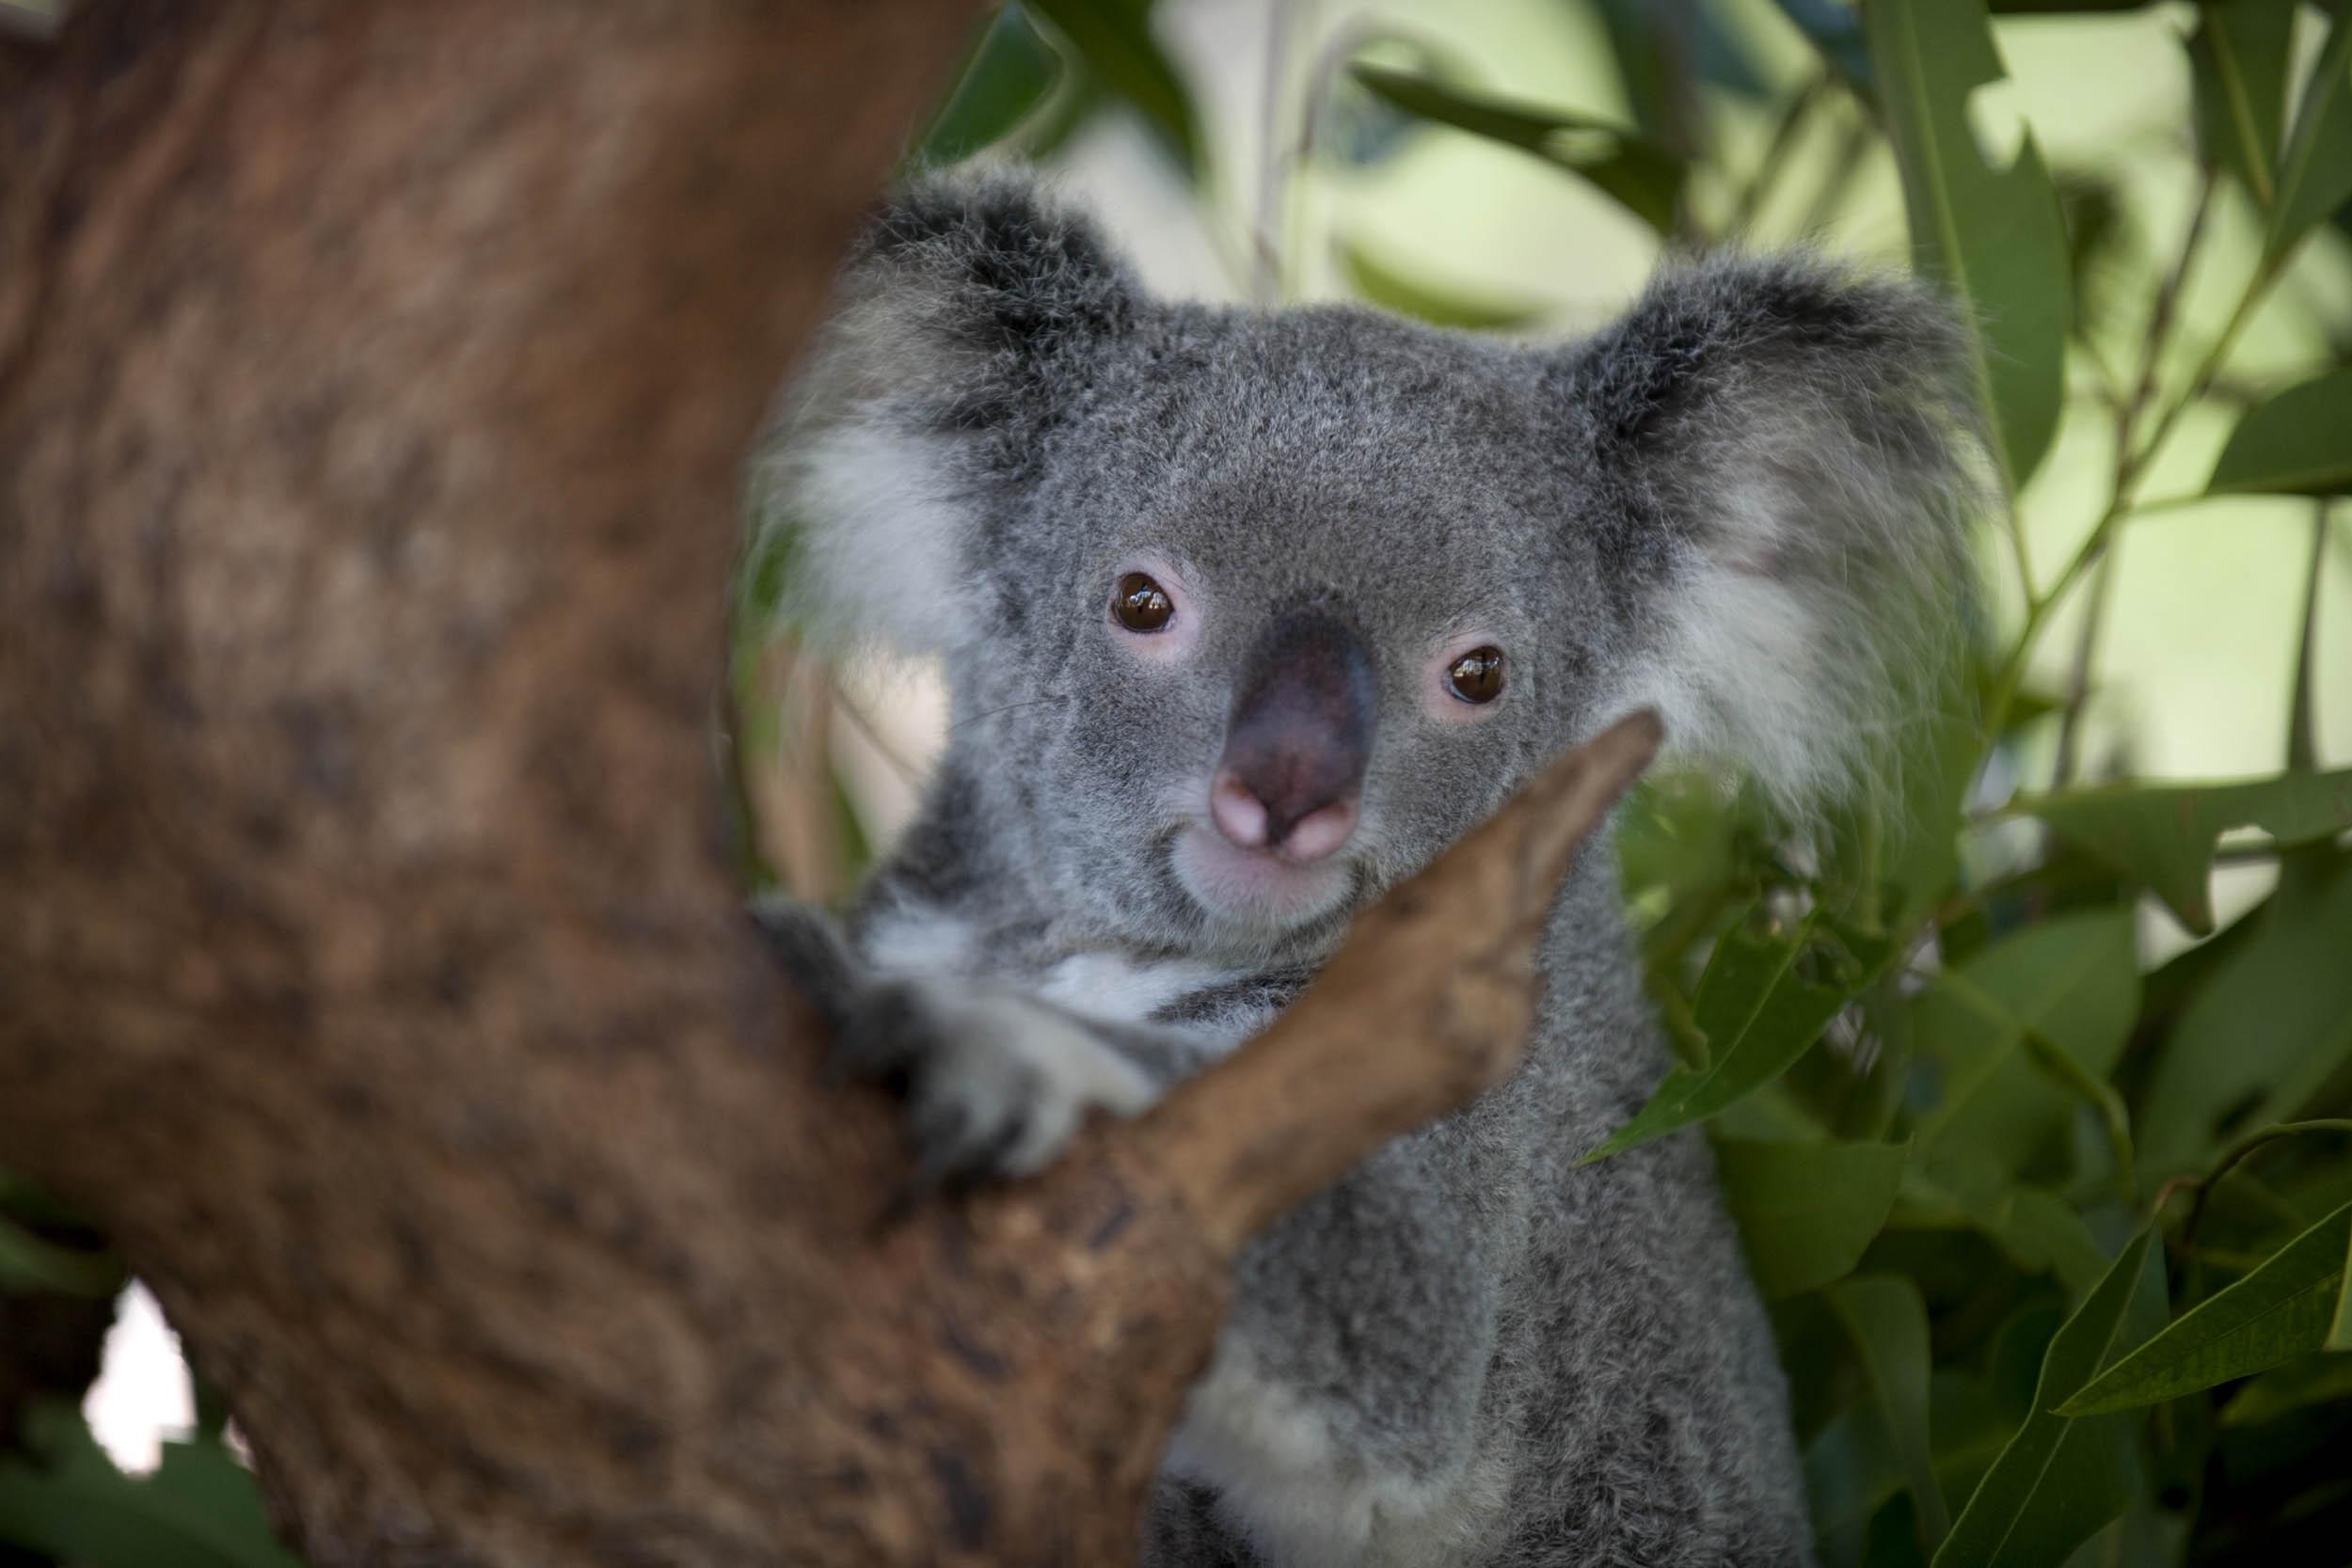 Koala, Australia - Gaia - Hector Garrido, Aerial and human photography